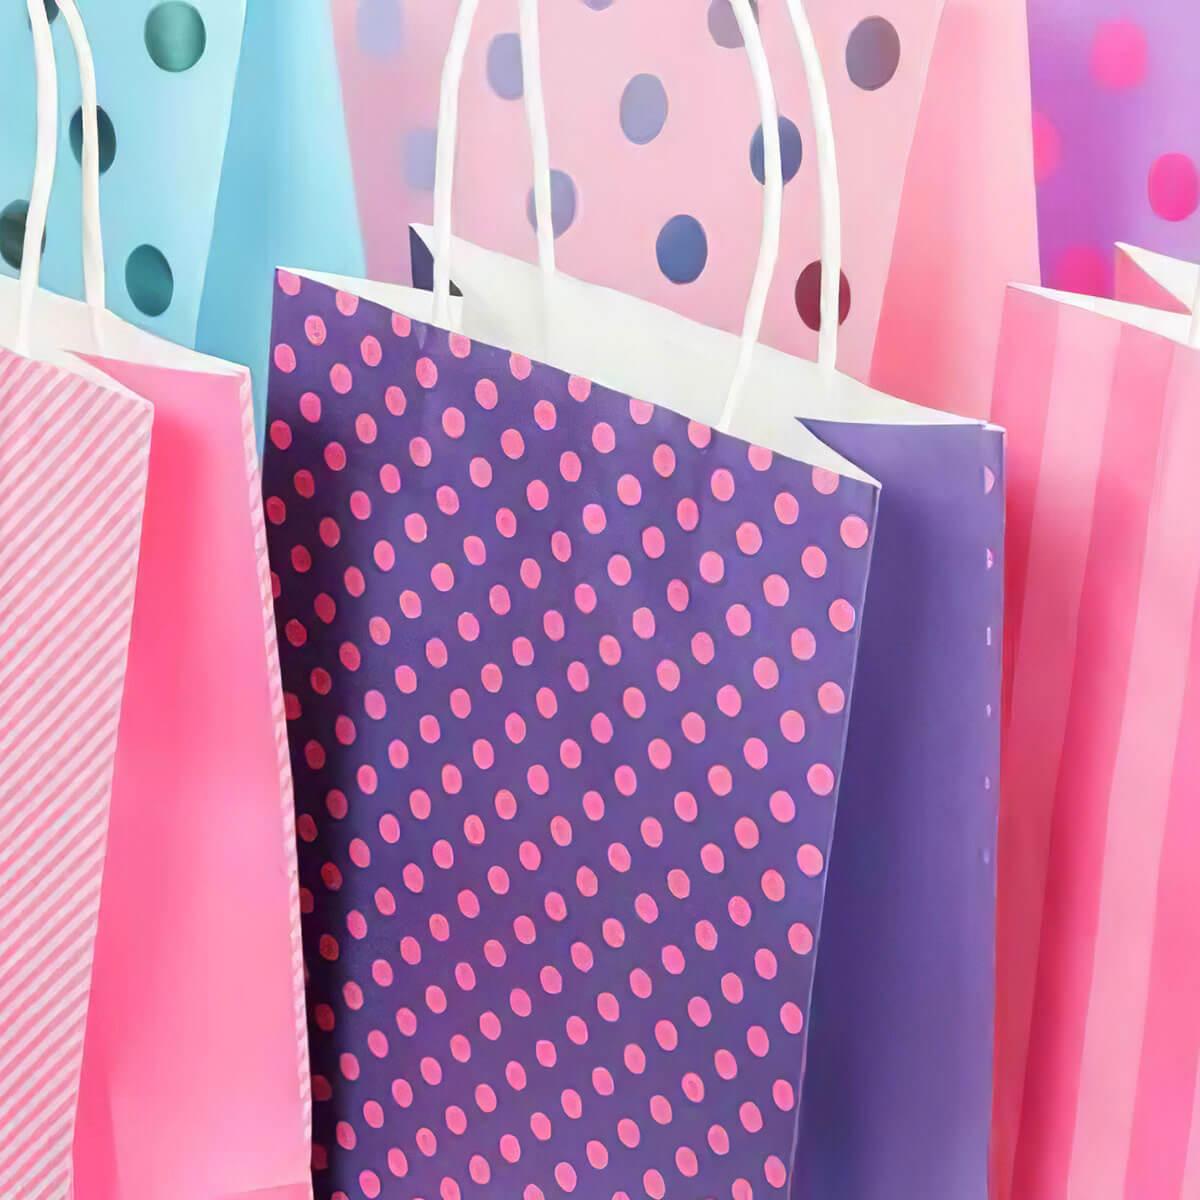 7 Type of Online Customers We Love